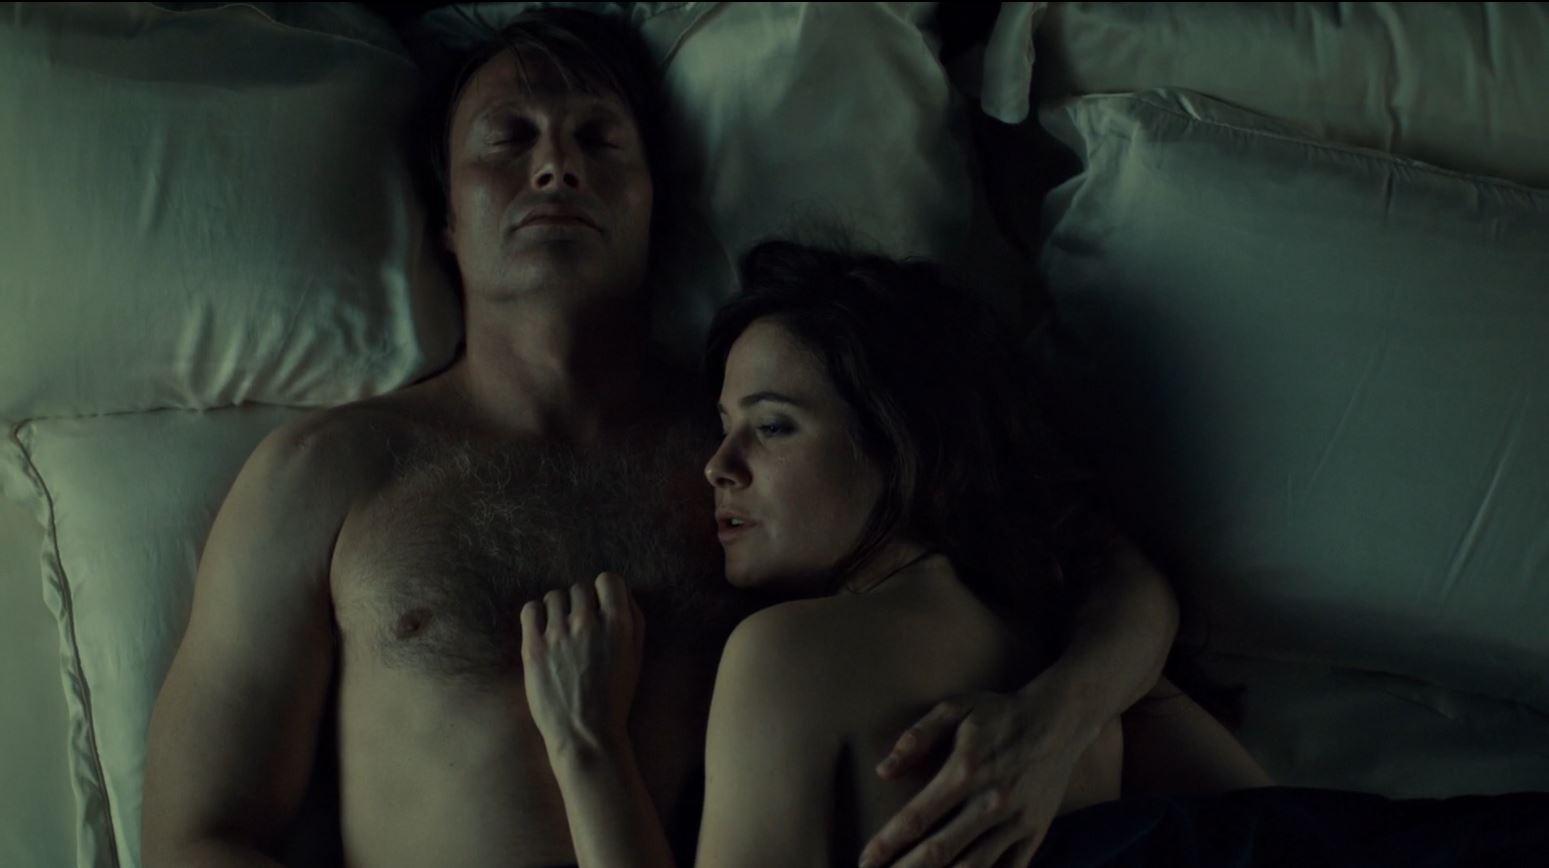 Hannibal Season 2 Episode 8 Su-zakana - Hannibal and Bloom in bed